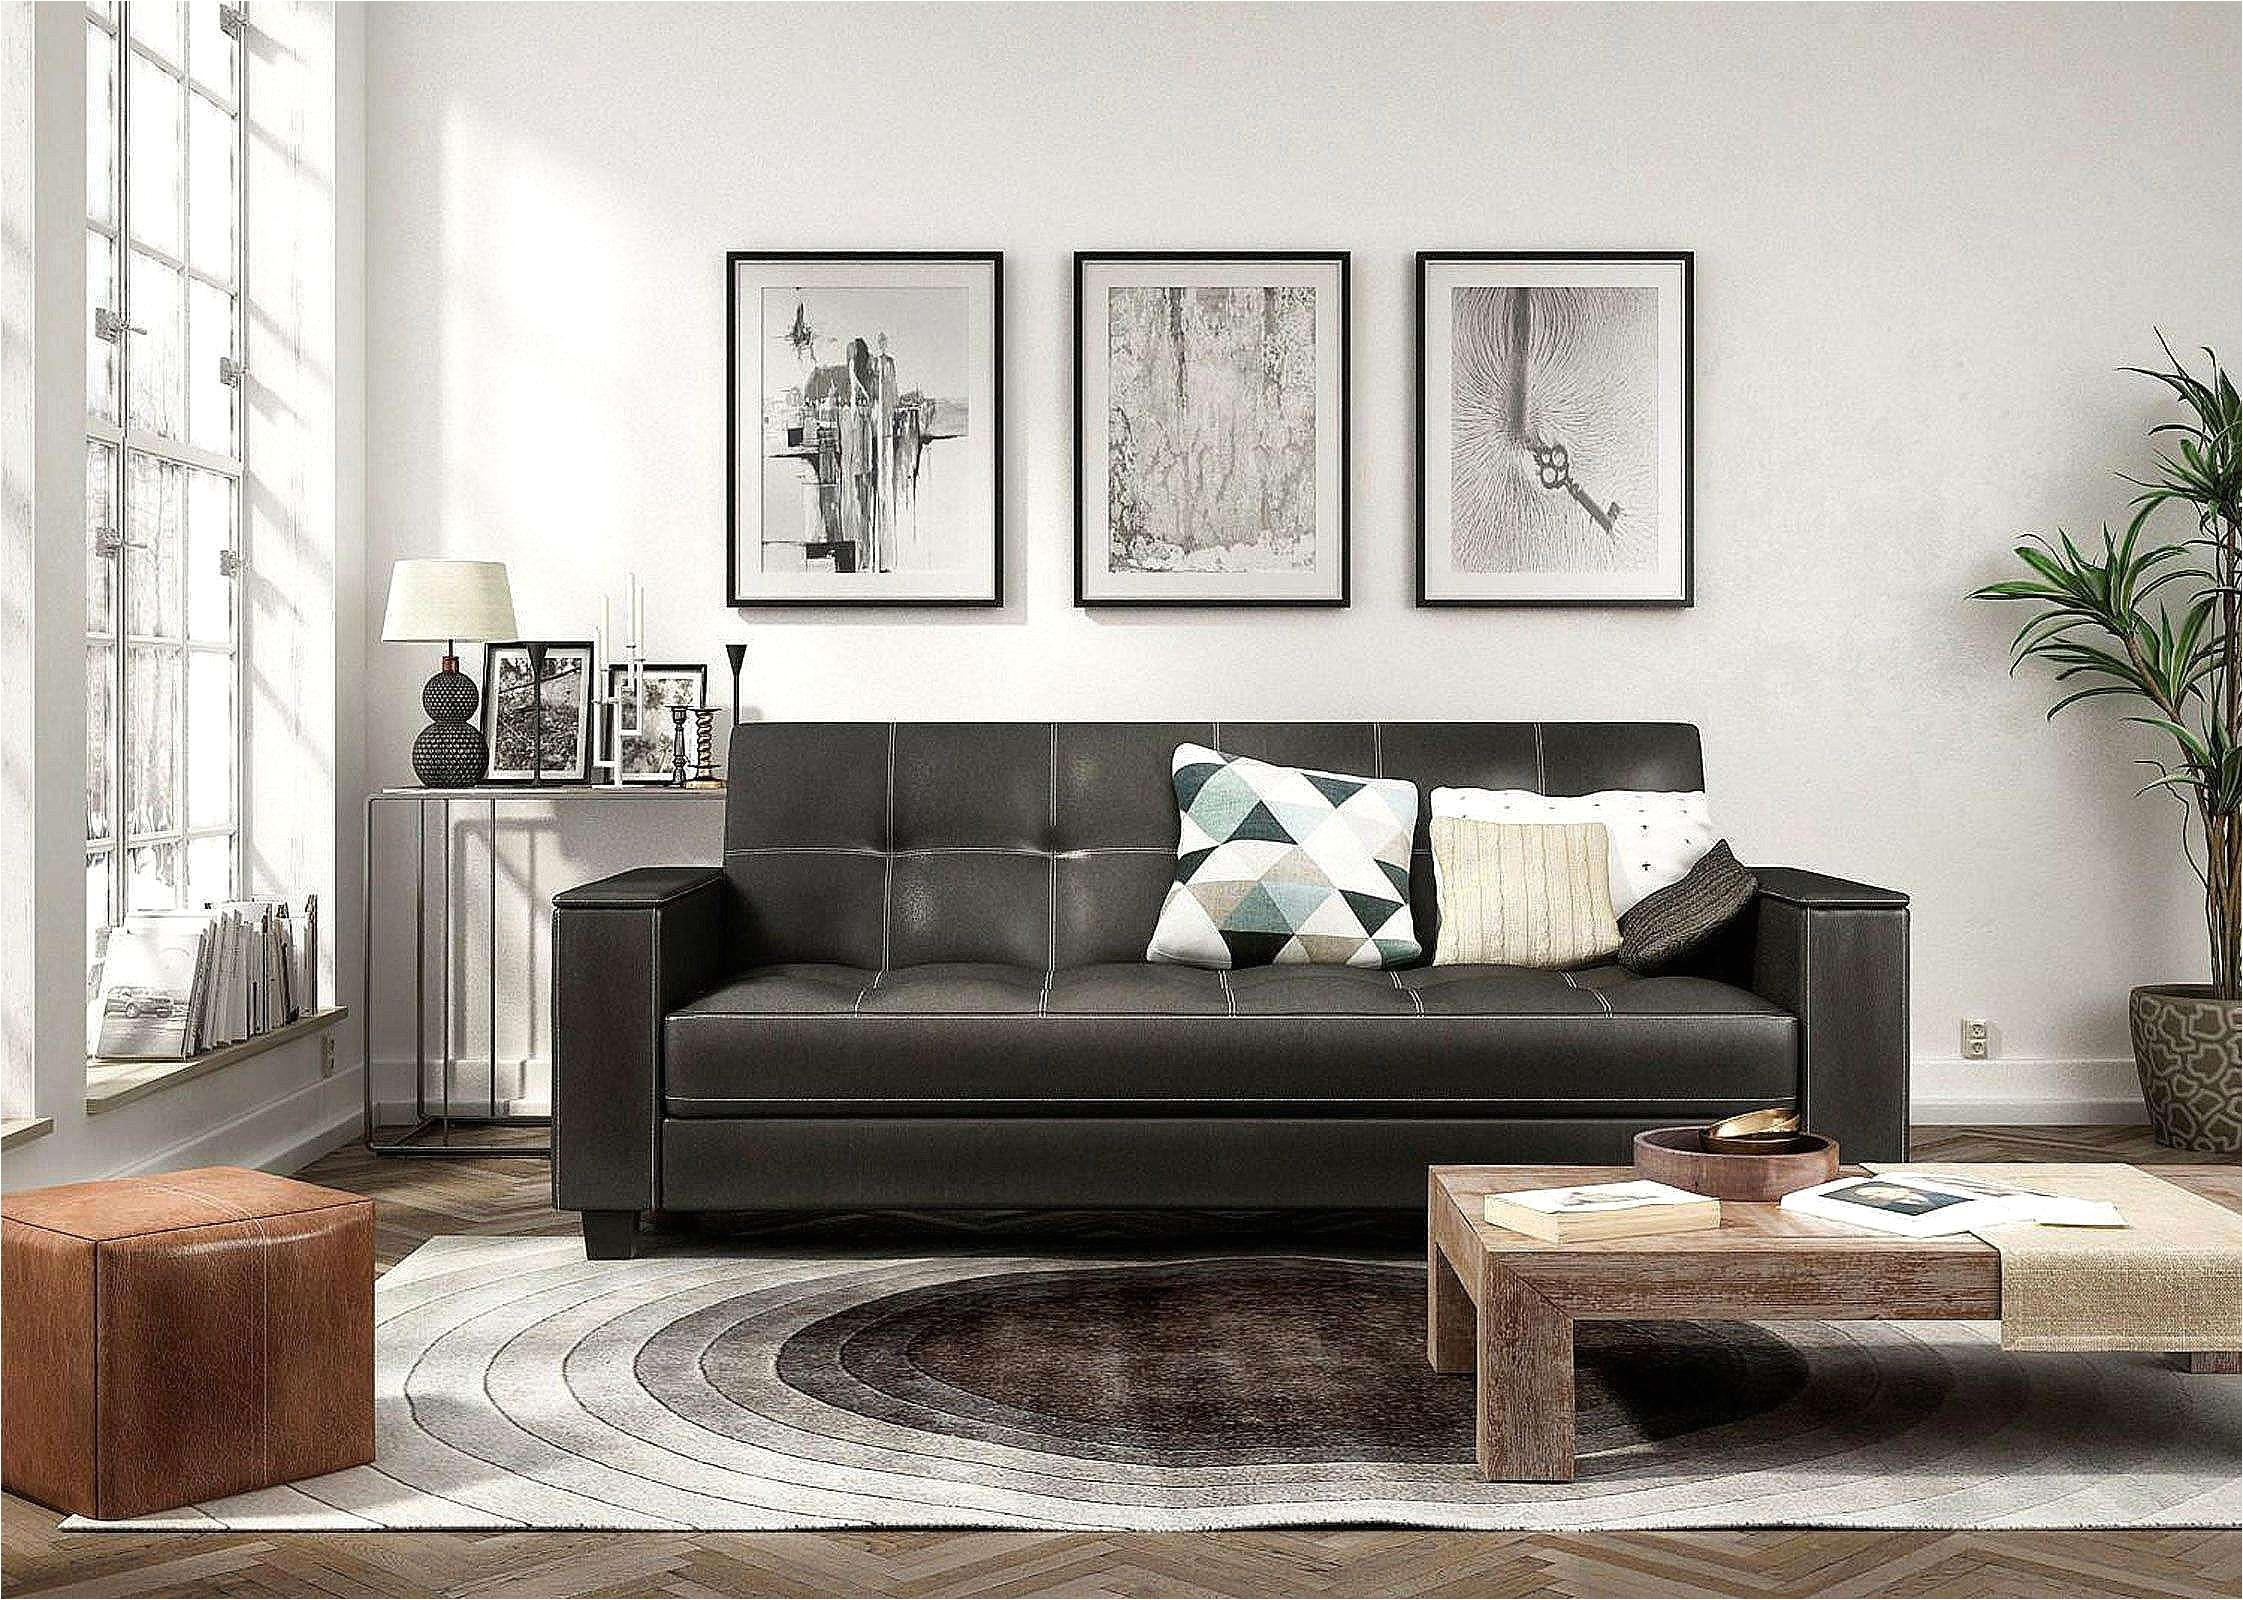 macys furniture dining room sets elegant modern living room furniture new gunstige sofa macys furniture 0d